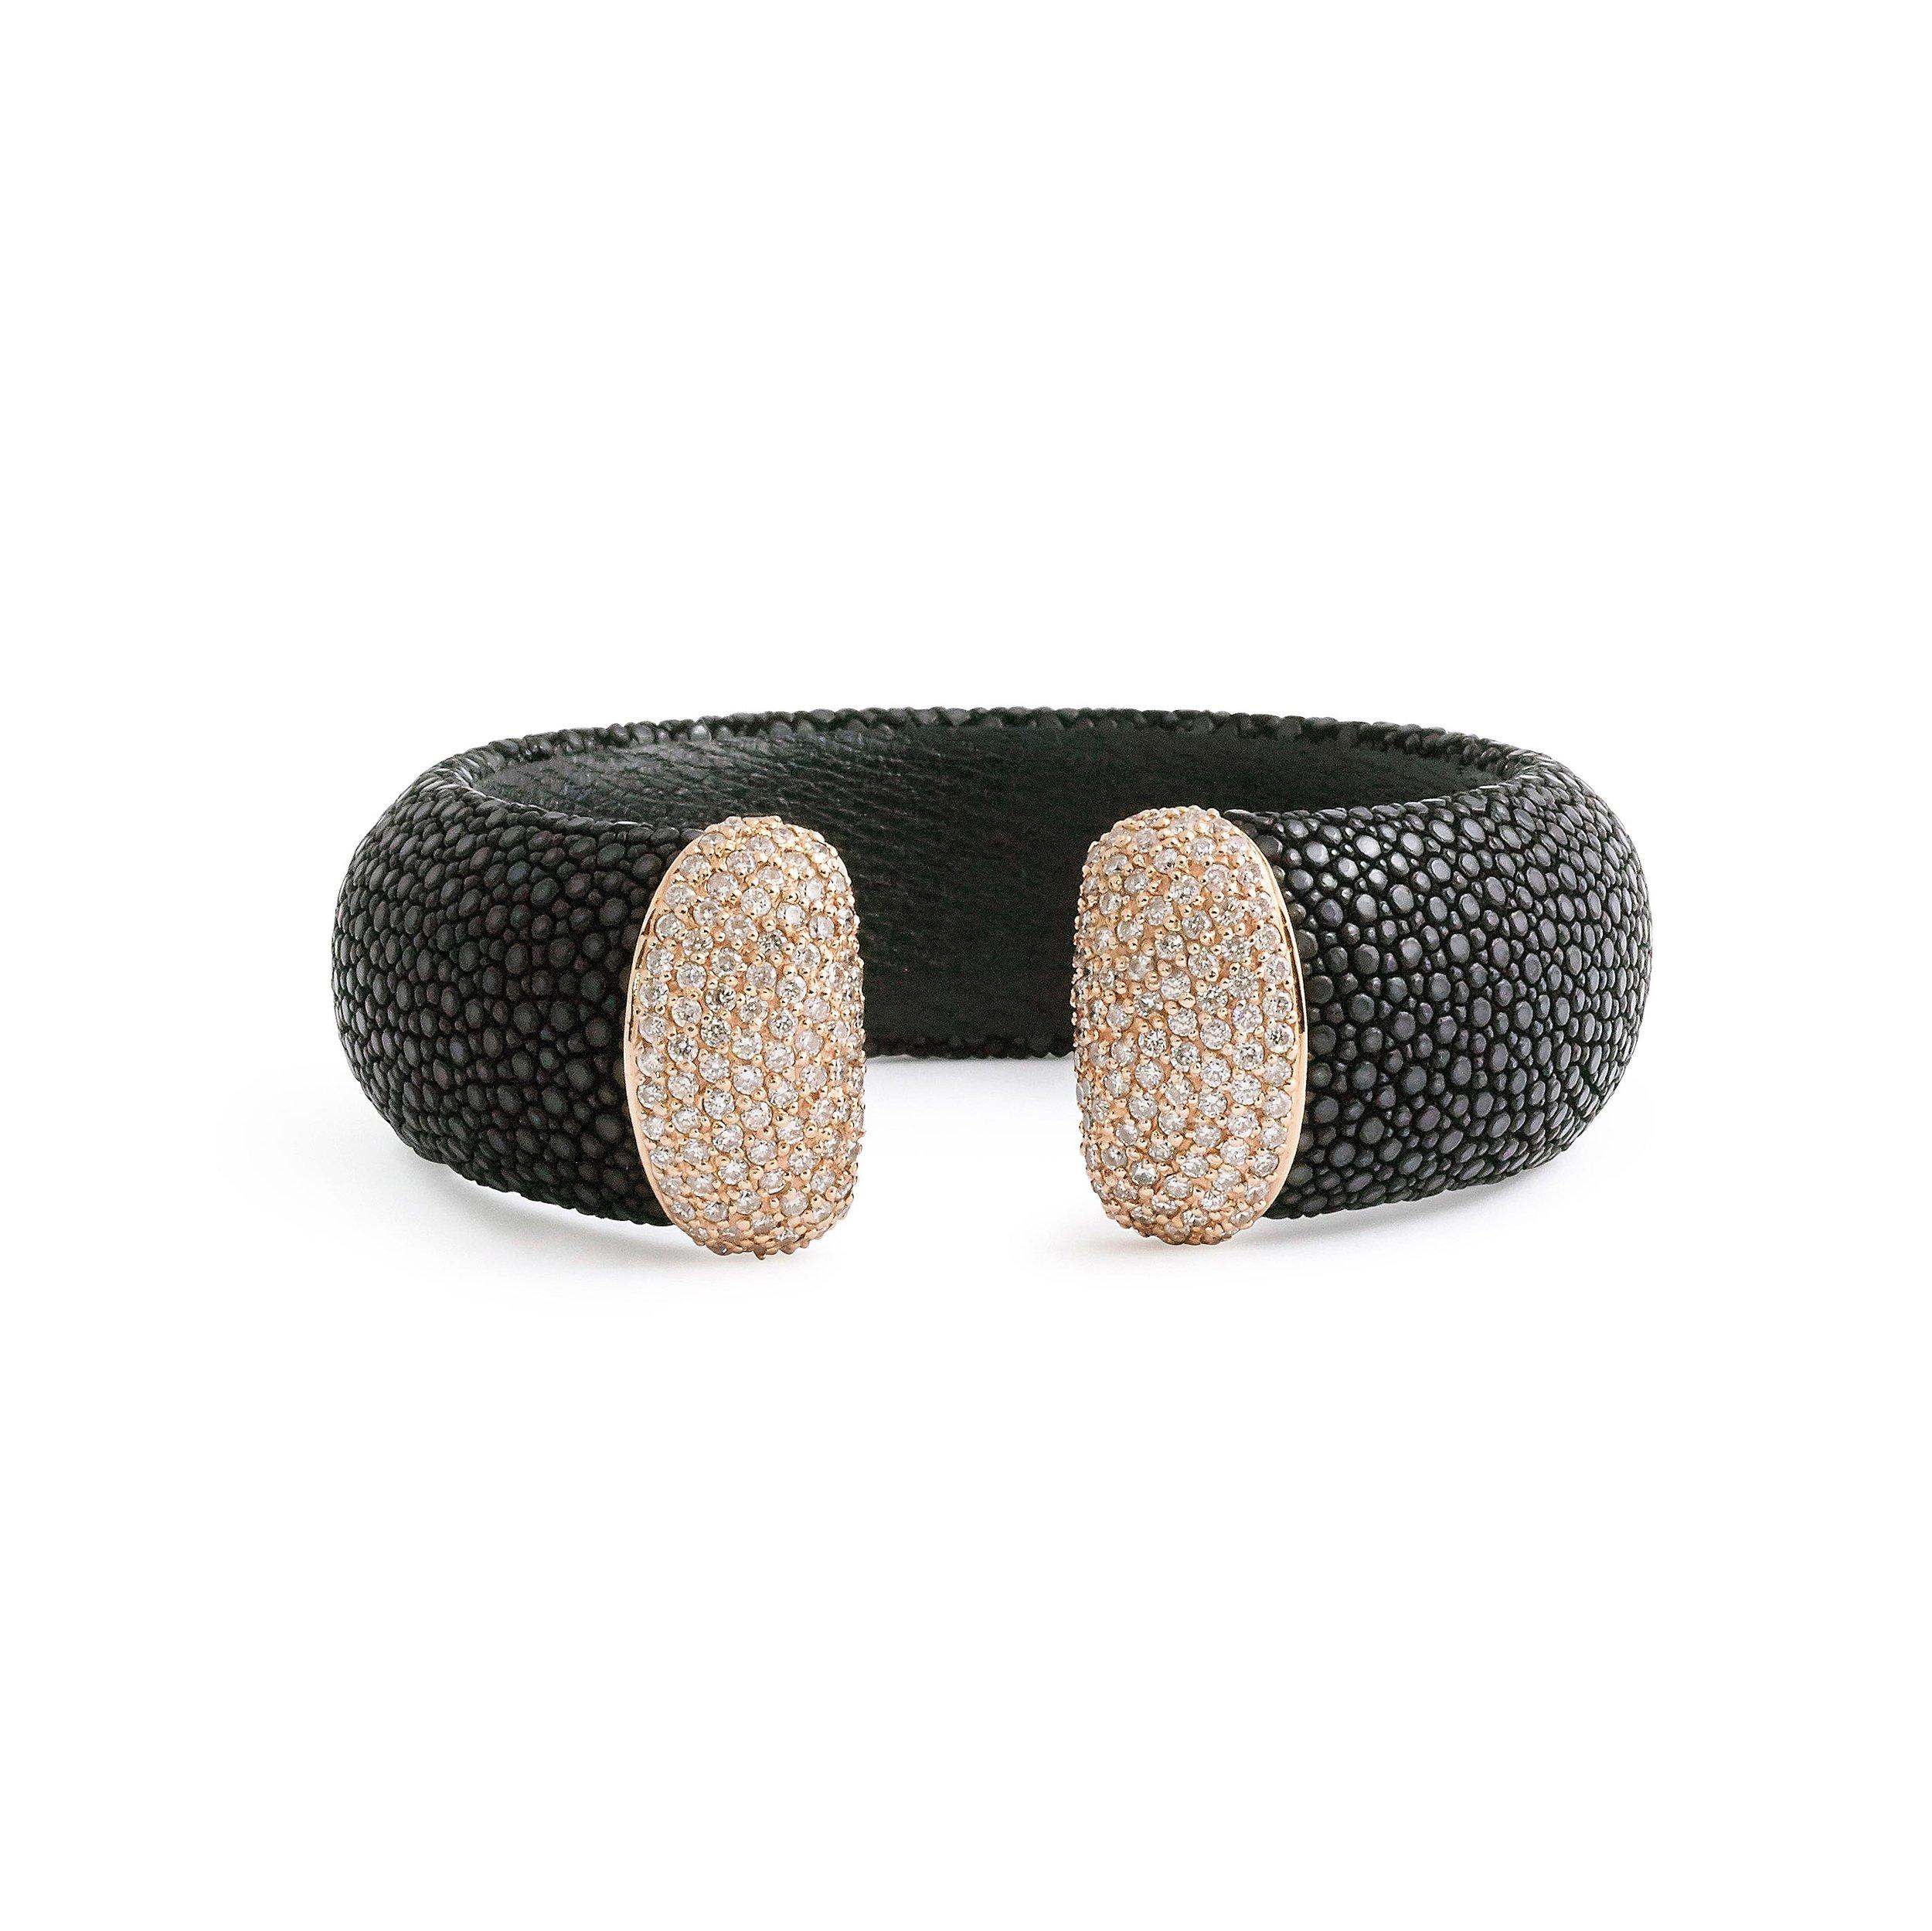 Black Stingray Leather And Diamond Cuff